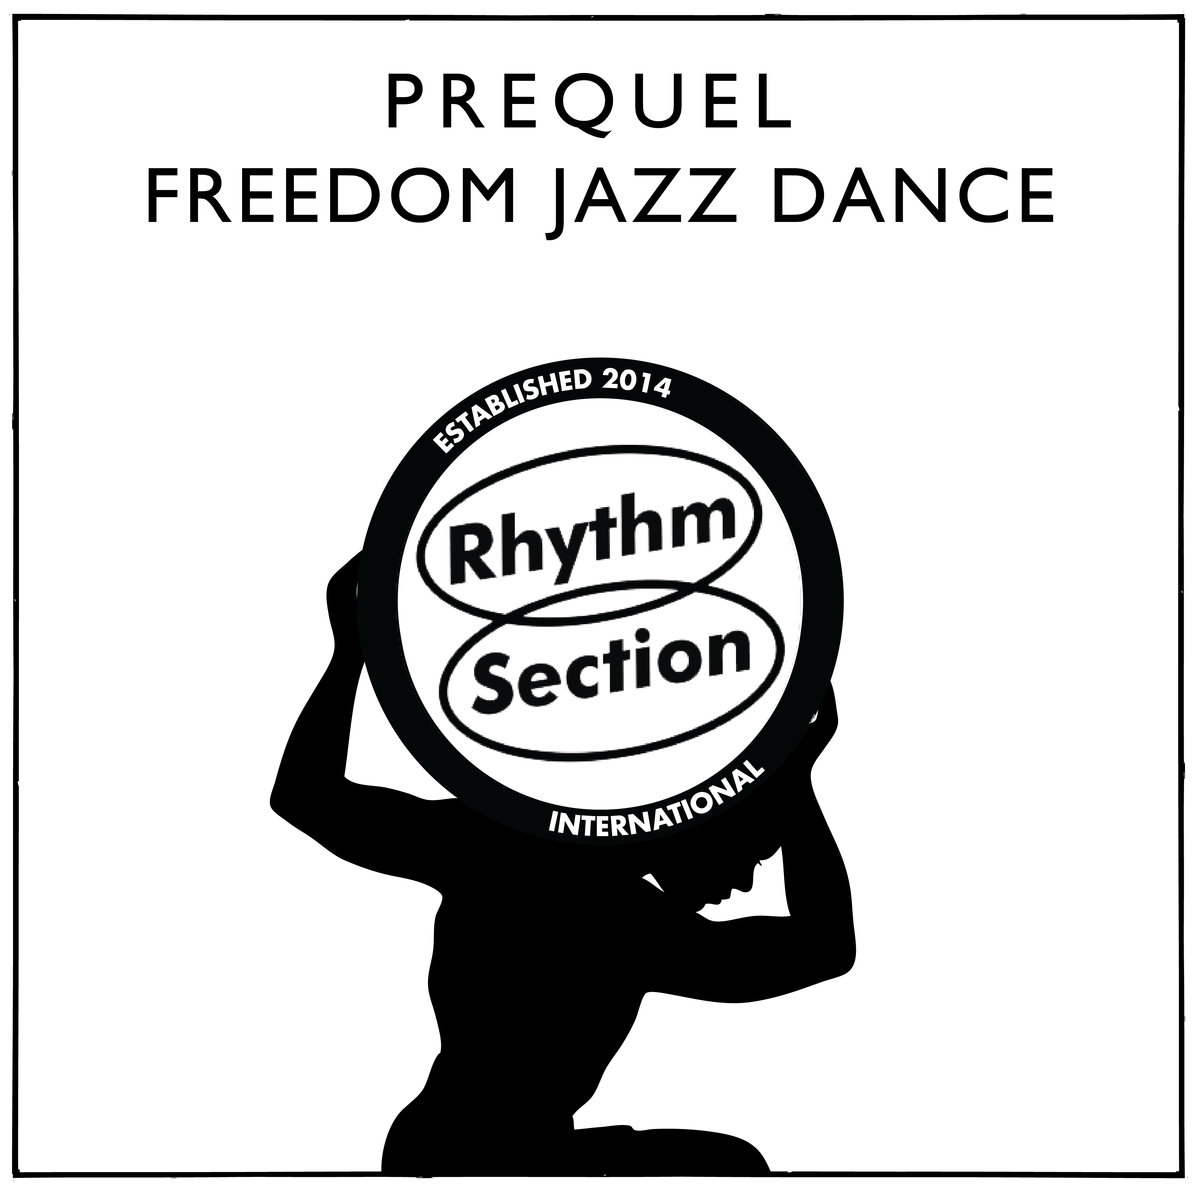 Prequel – Freedom Jazz Dance (Rhythm Section International)